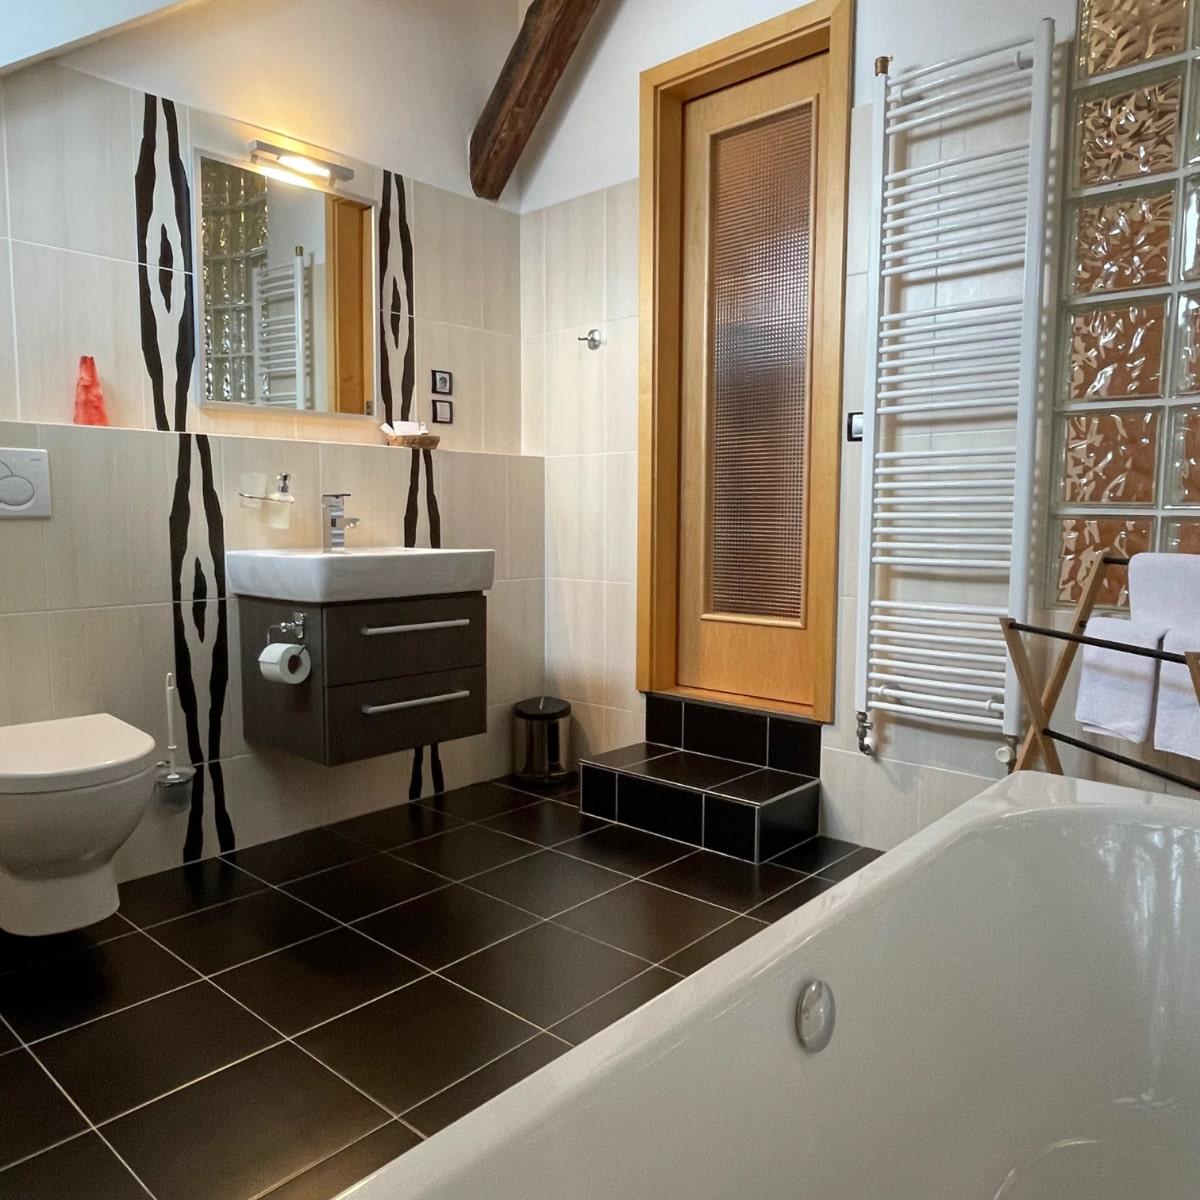 Apartmán Executive - koupelna